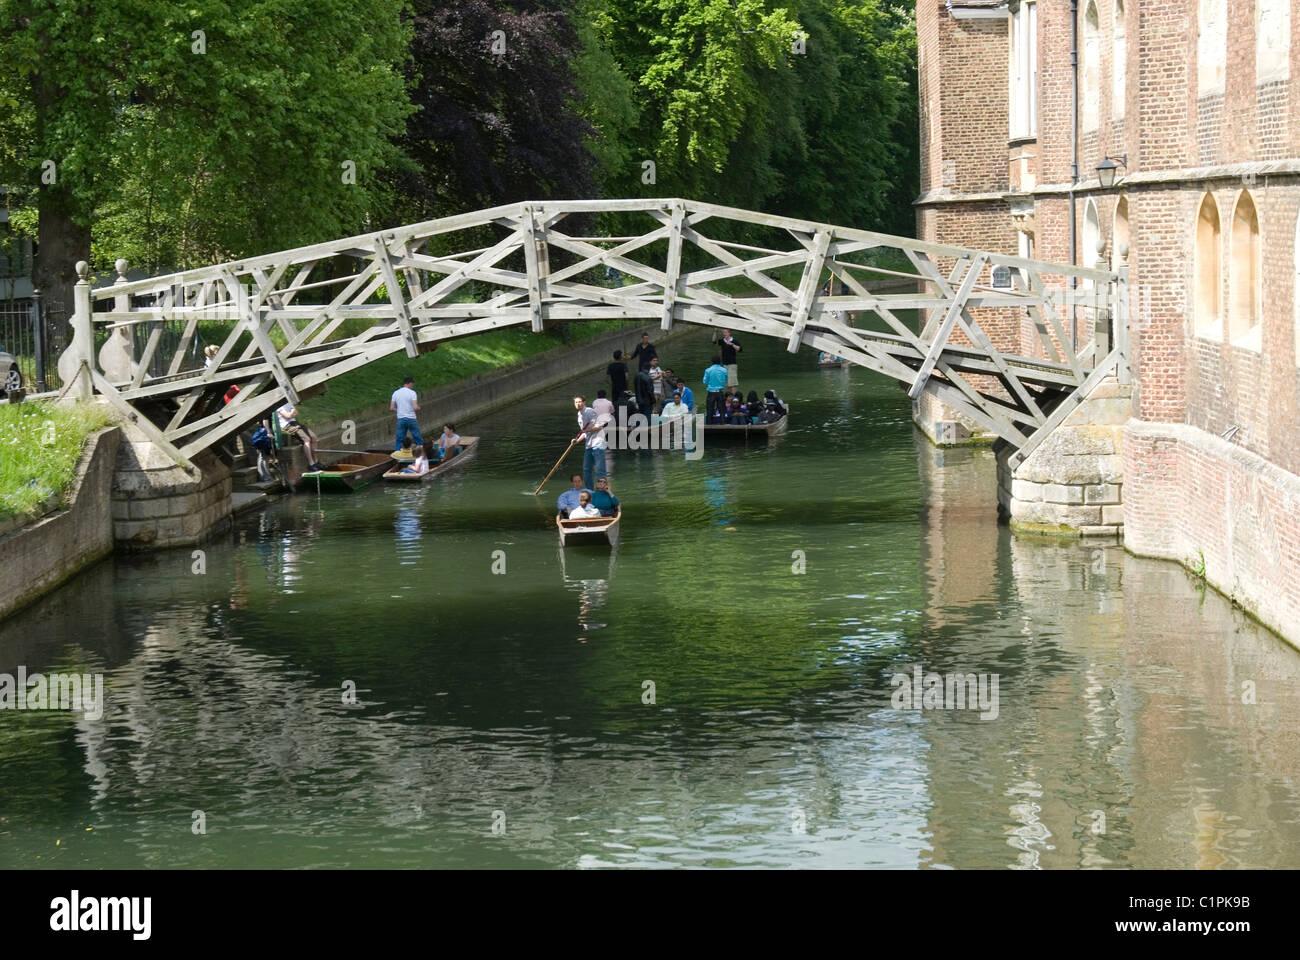 England, Cambridge, Mathematical Bridge, punting on river Cam - Stock Image